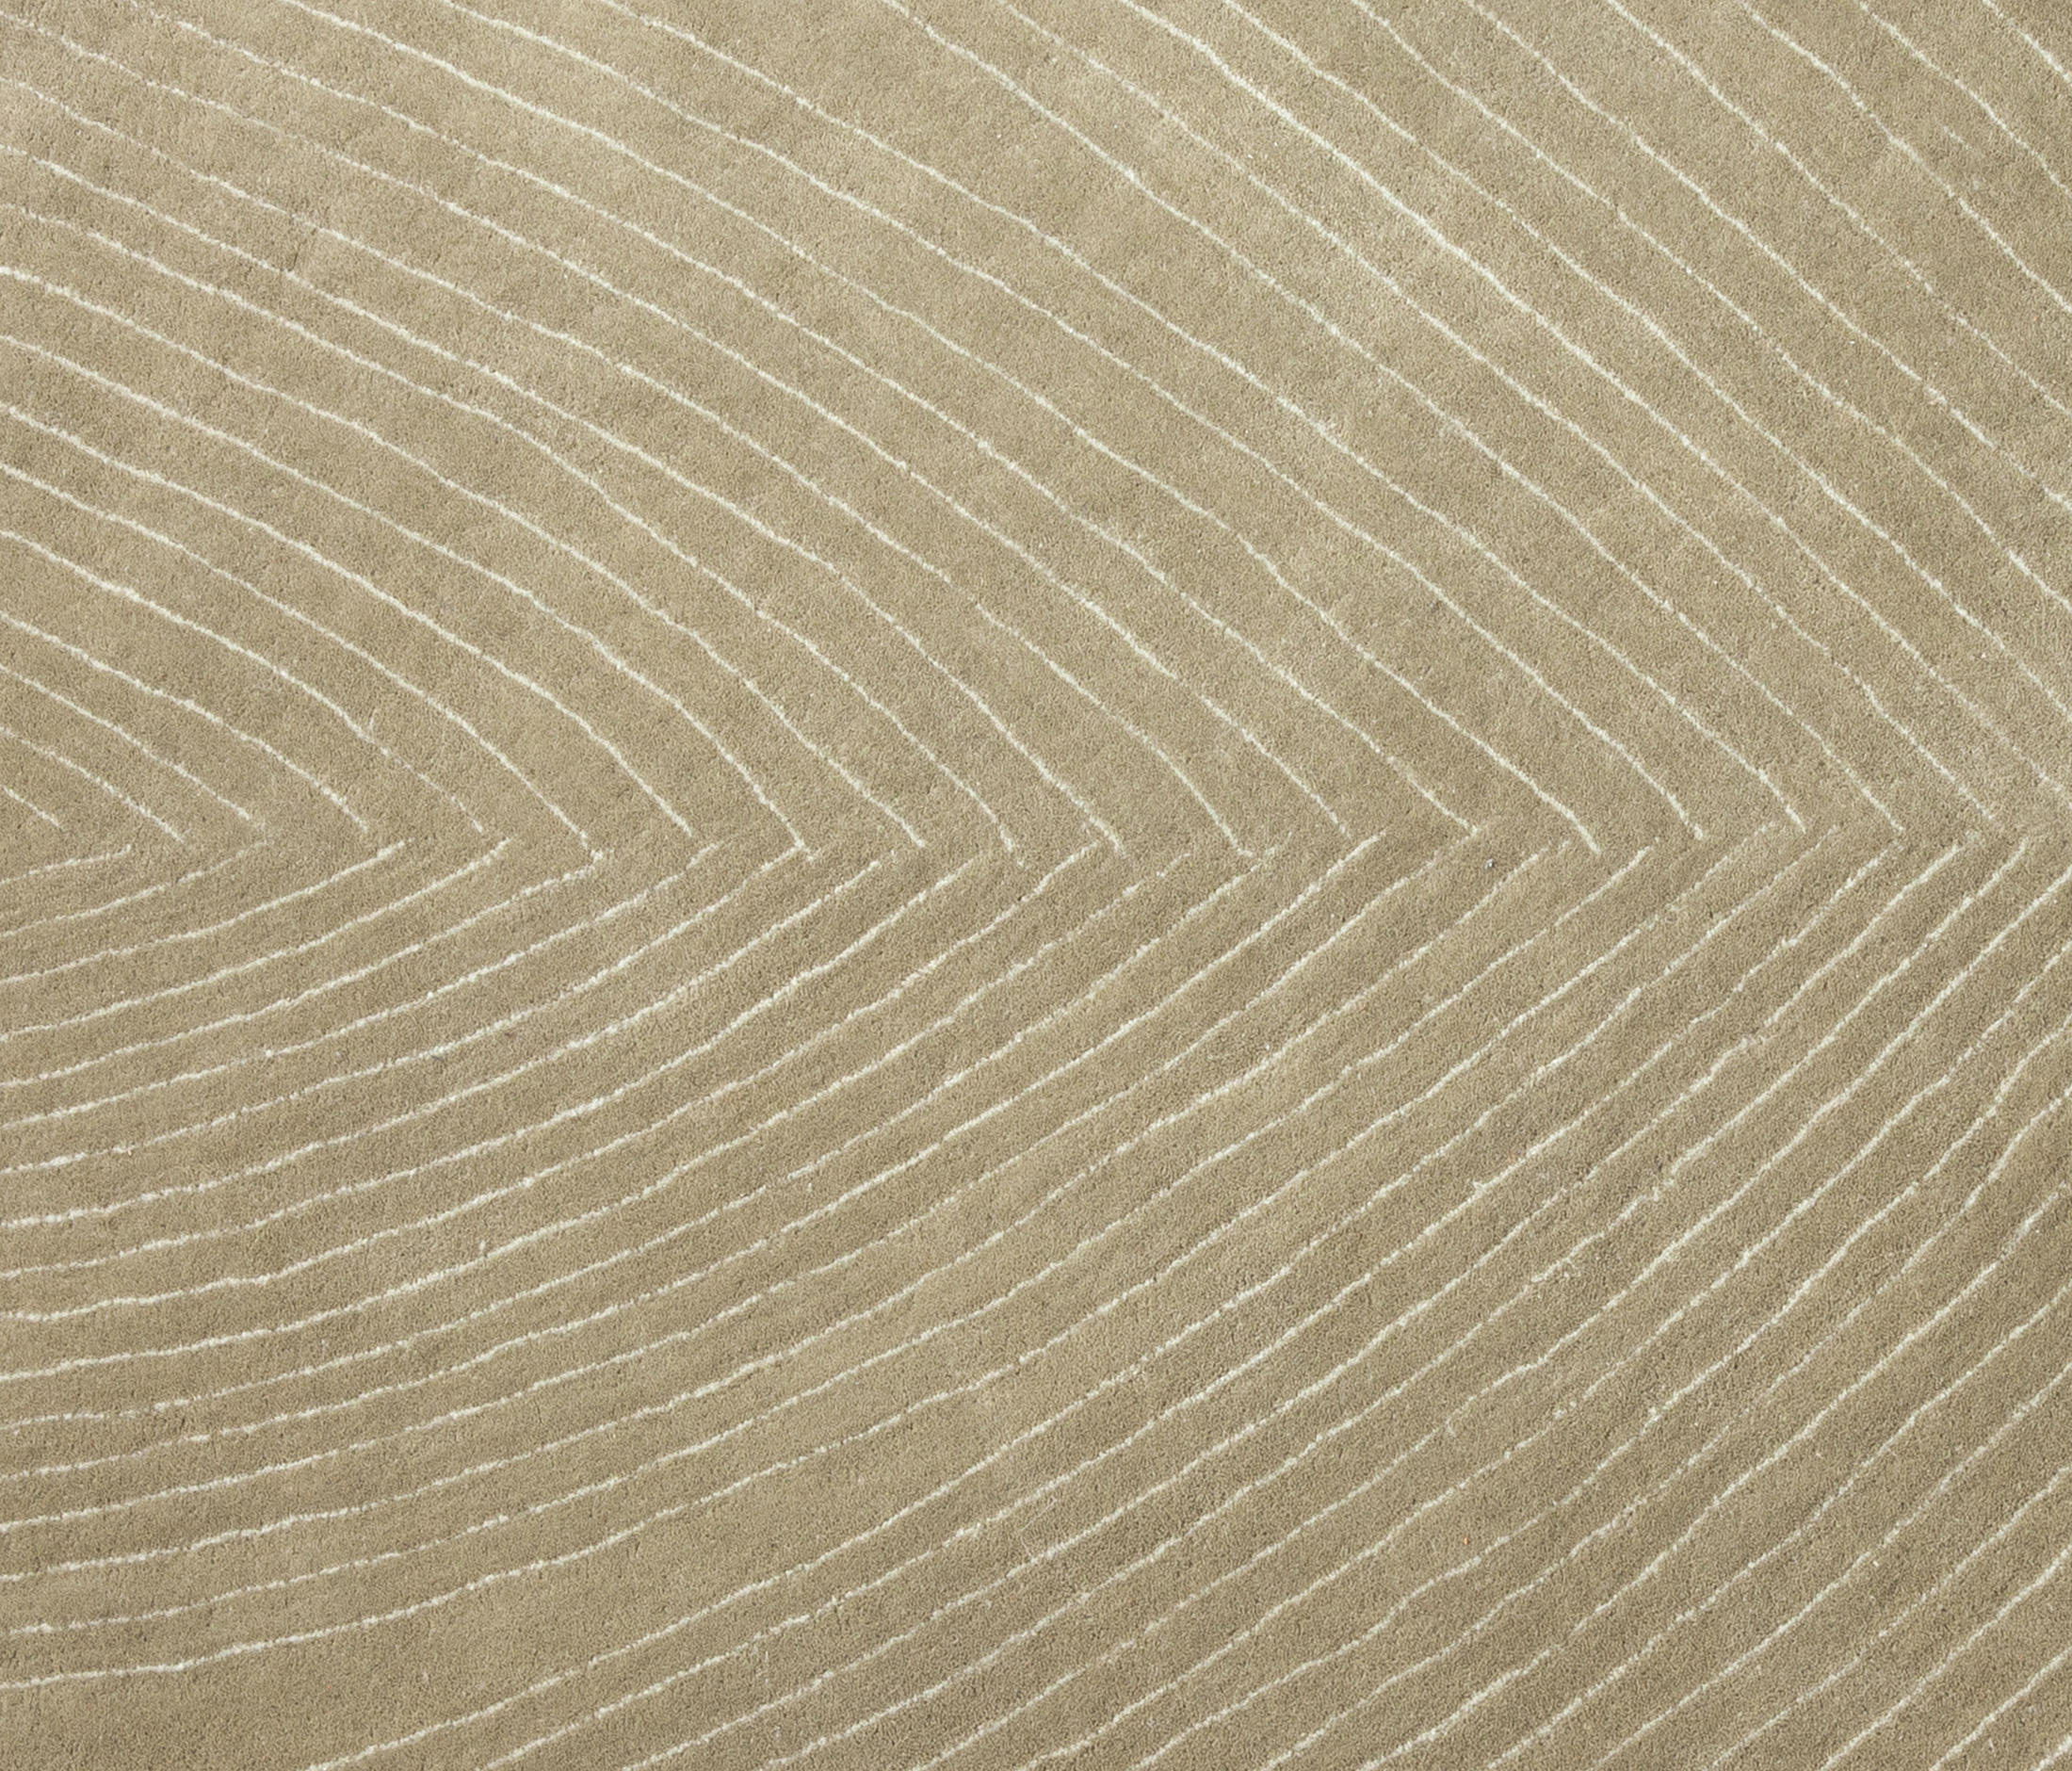 quill m formatteppiche designerteppiche von nanimarquina architonic. Black Bedroom Furniture Sets. Home Design Ideas